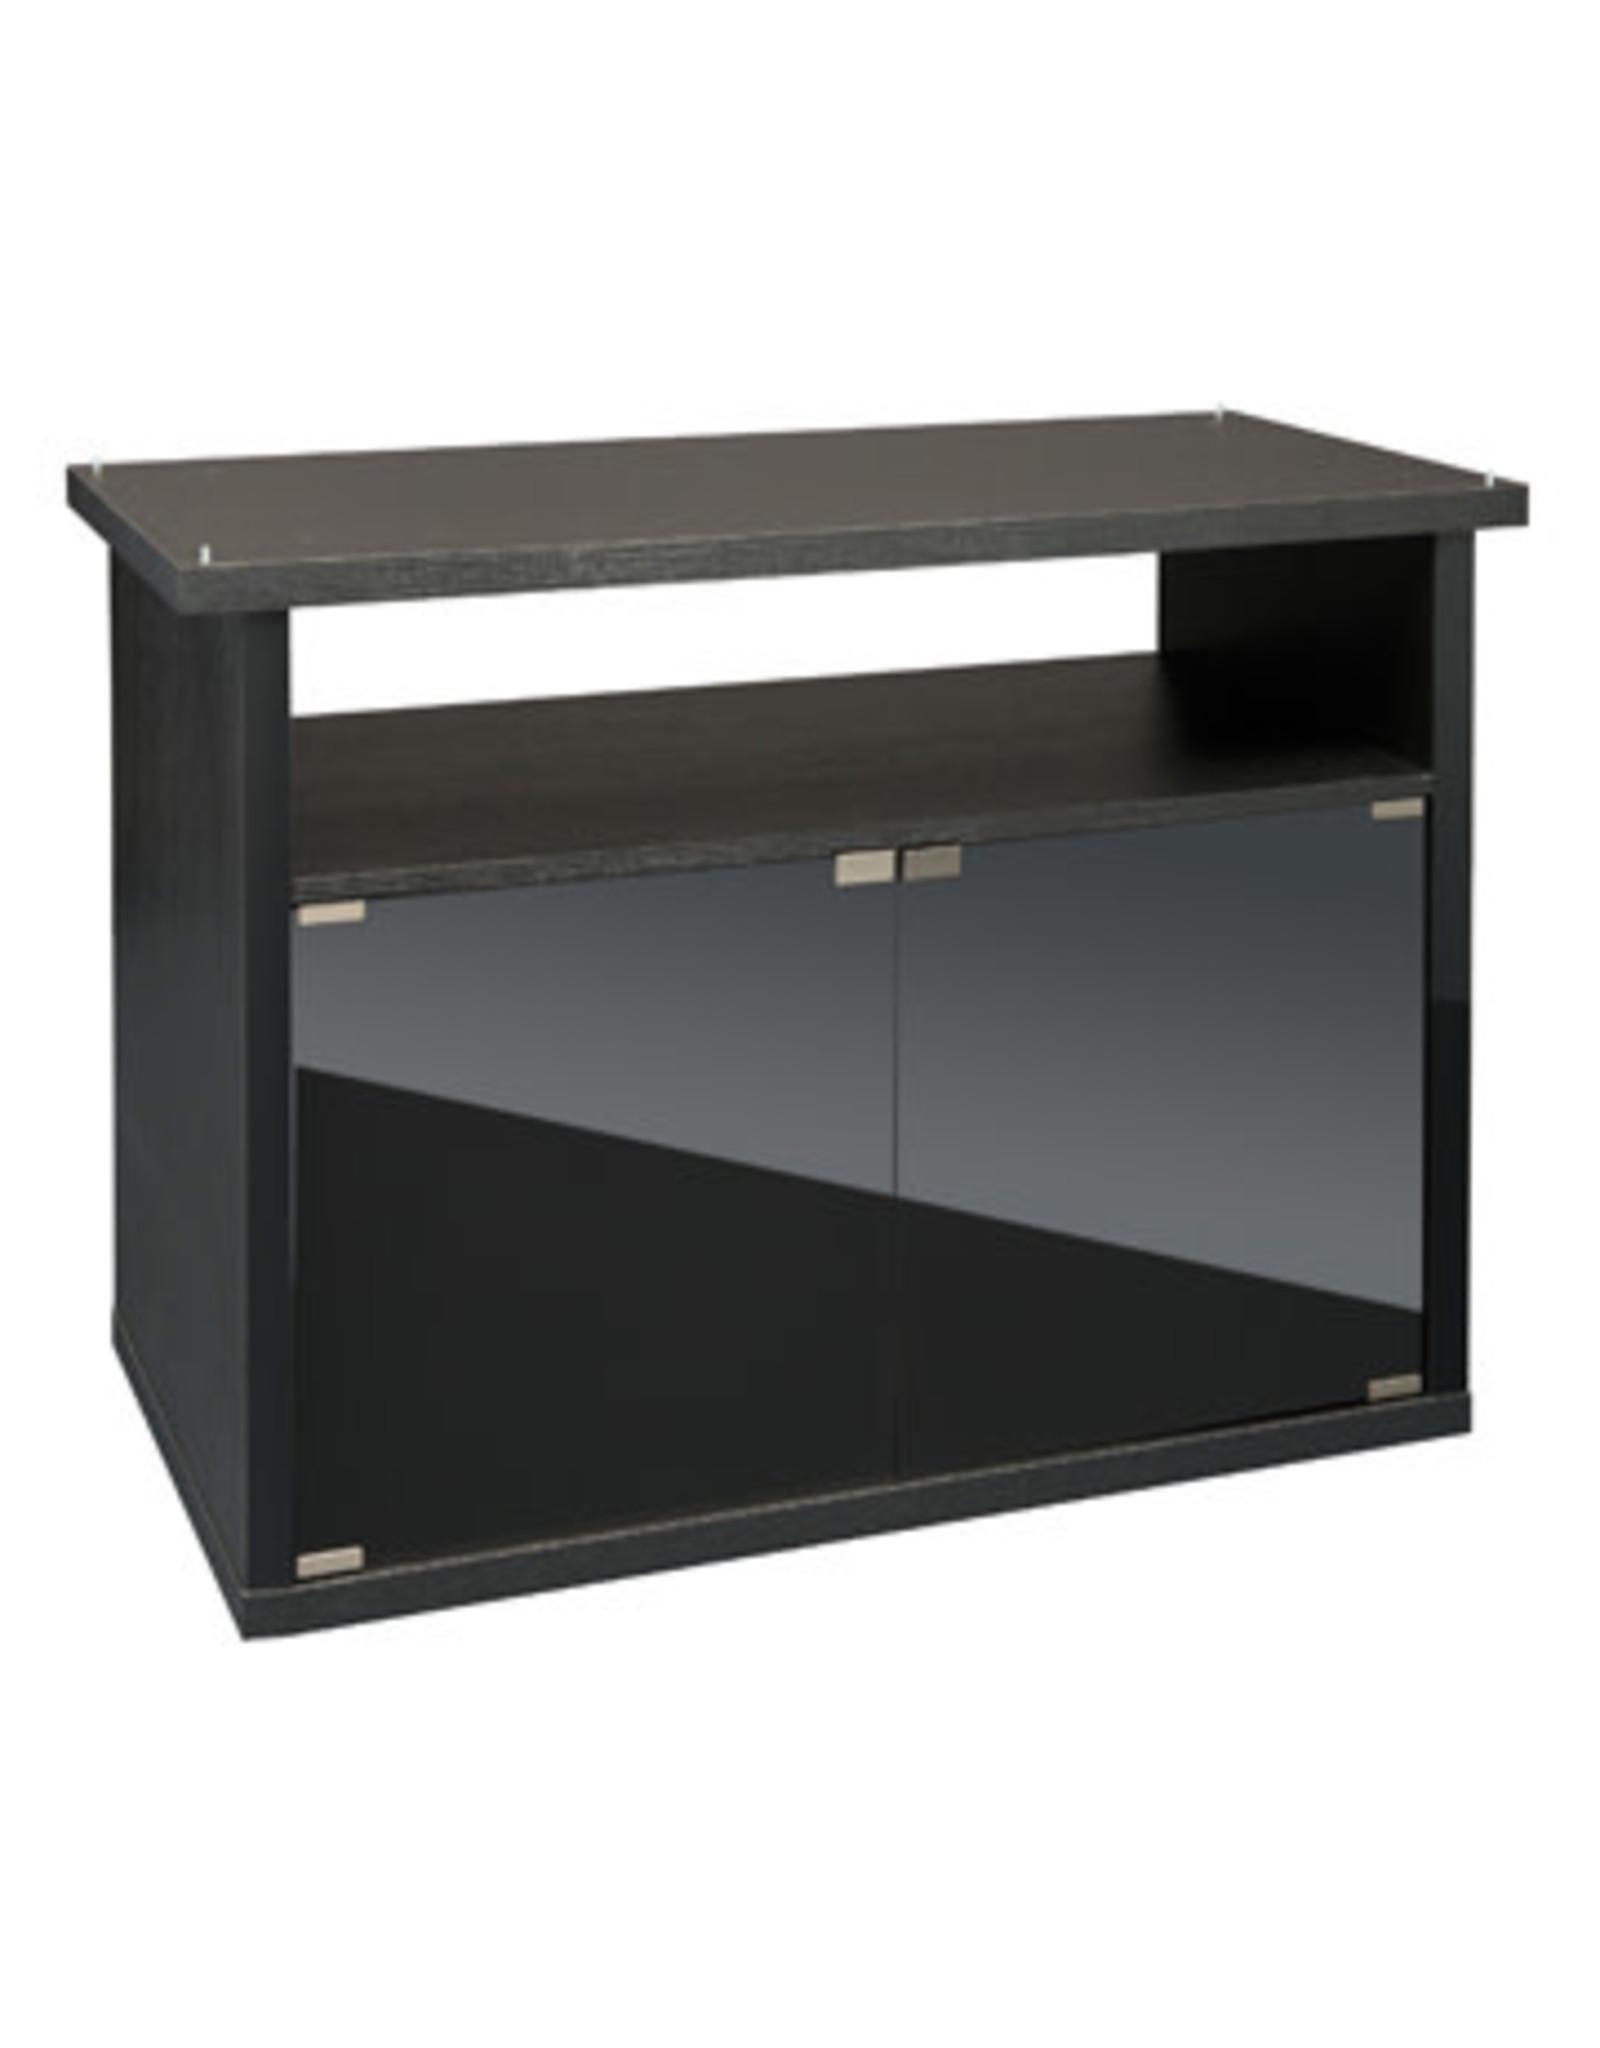 Exo Terra Cabinet Large 91.5 x 46.5 x 70.5 cm (36 x 18 1/4 x 27 3/4 in)